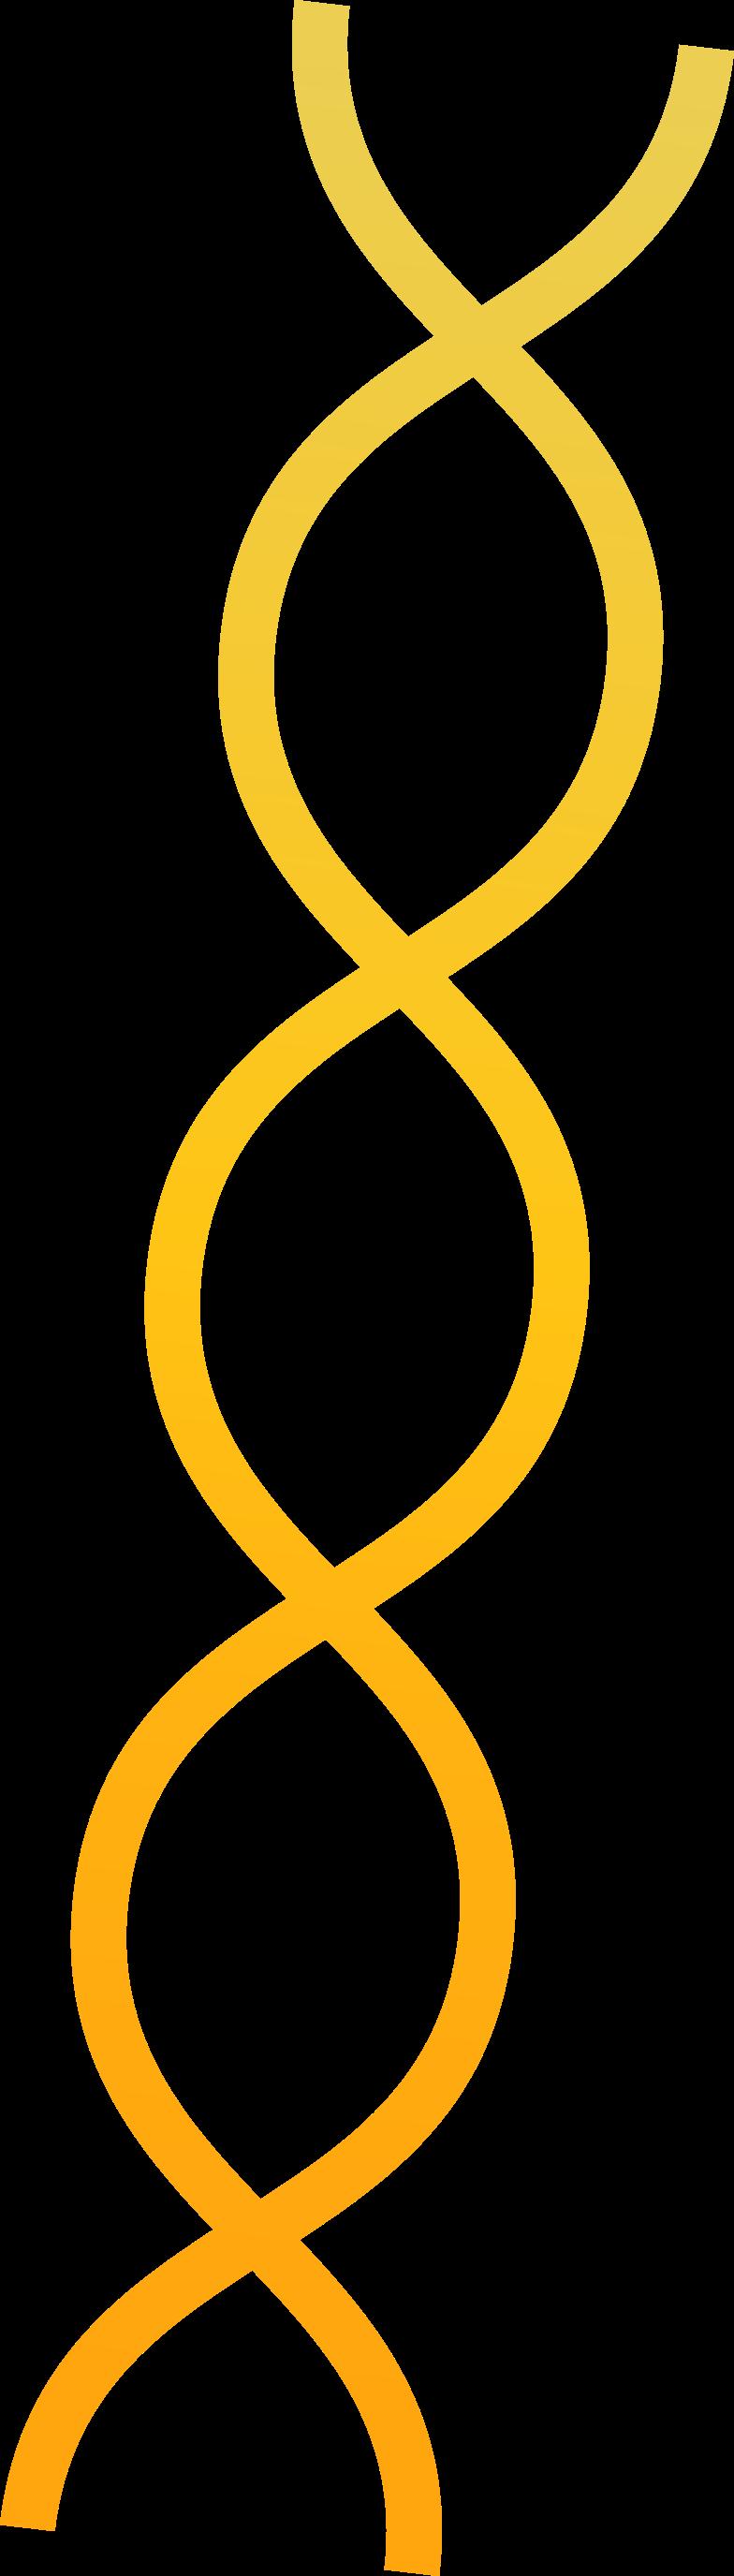 dnk Clipart illustration in PNG, SVG